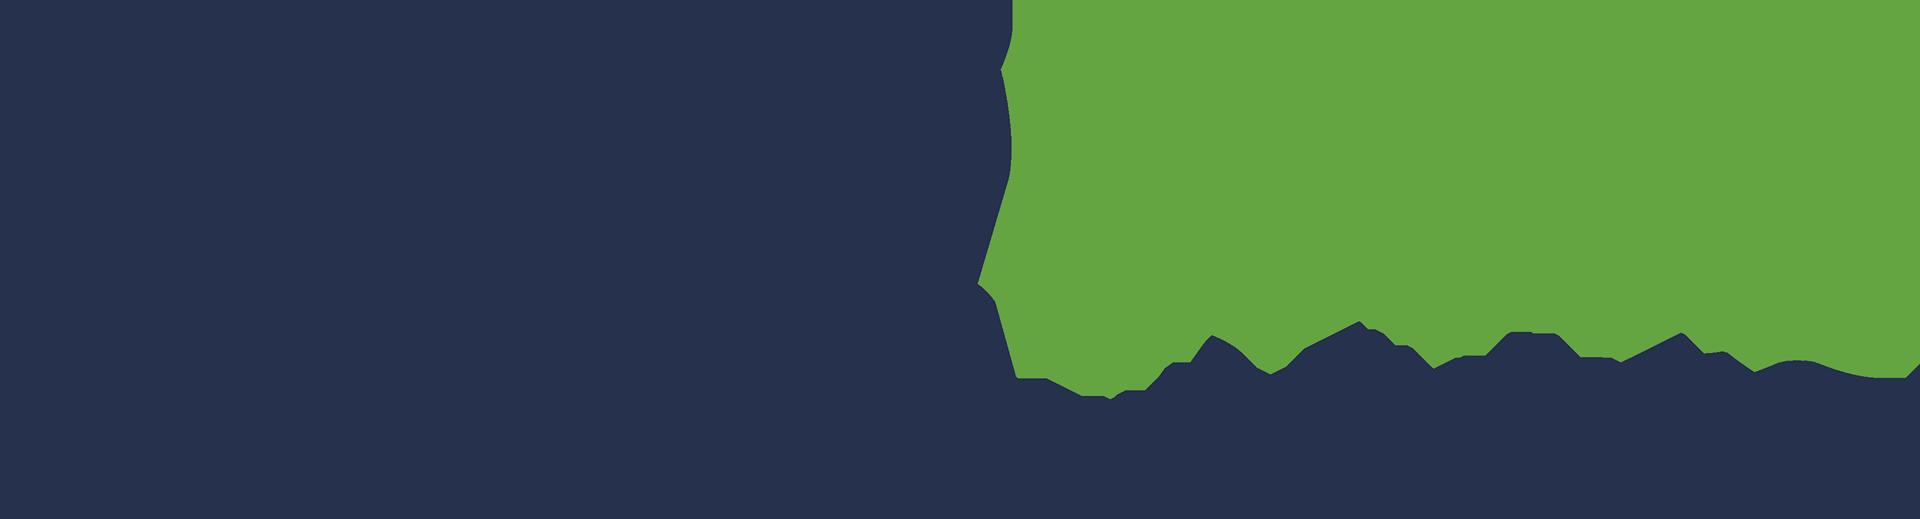 Empresas Desafio10x: Sistemas Online SpA /ERPyme